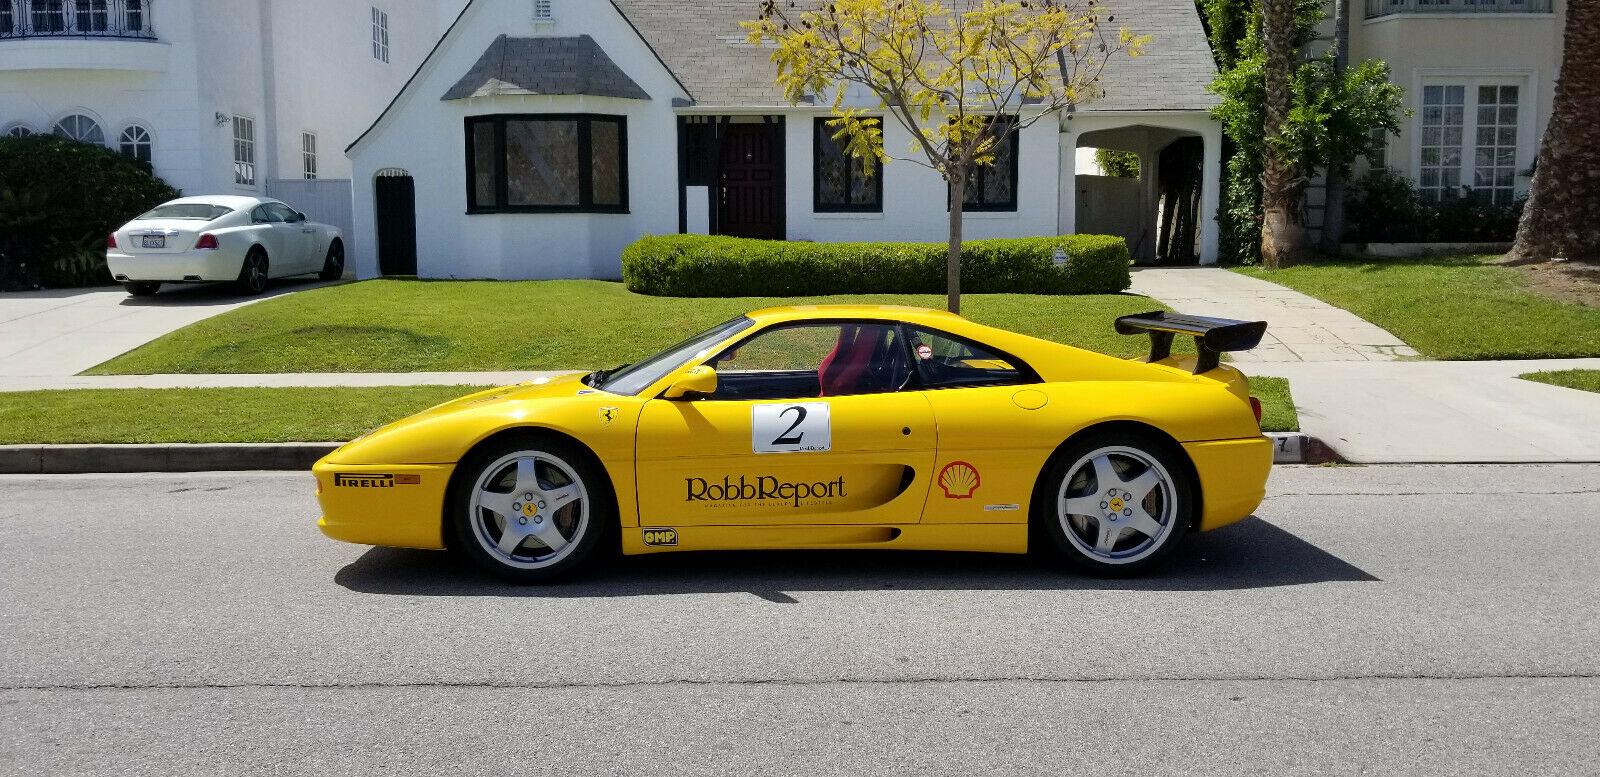 For Sale On Ebay 1997 Ferrari 355 Challenge Road Legal Restored Fchgt